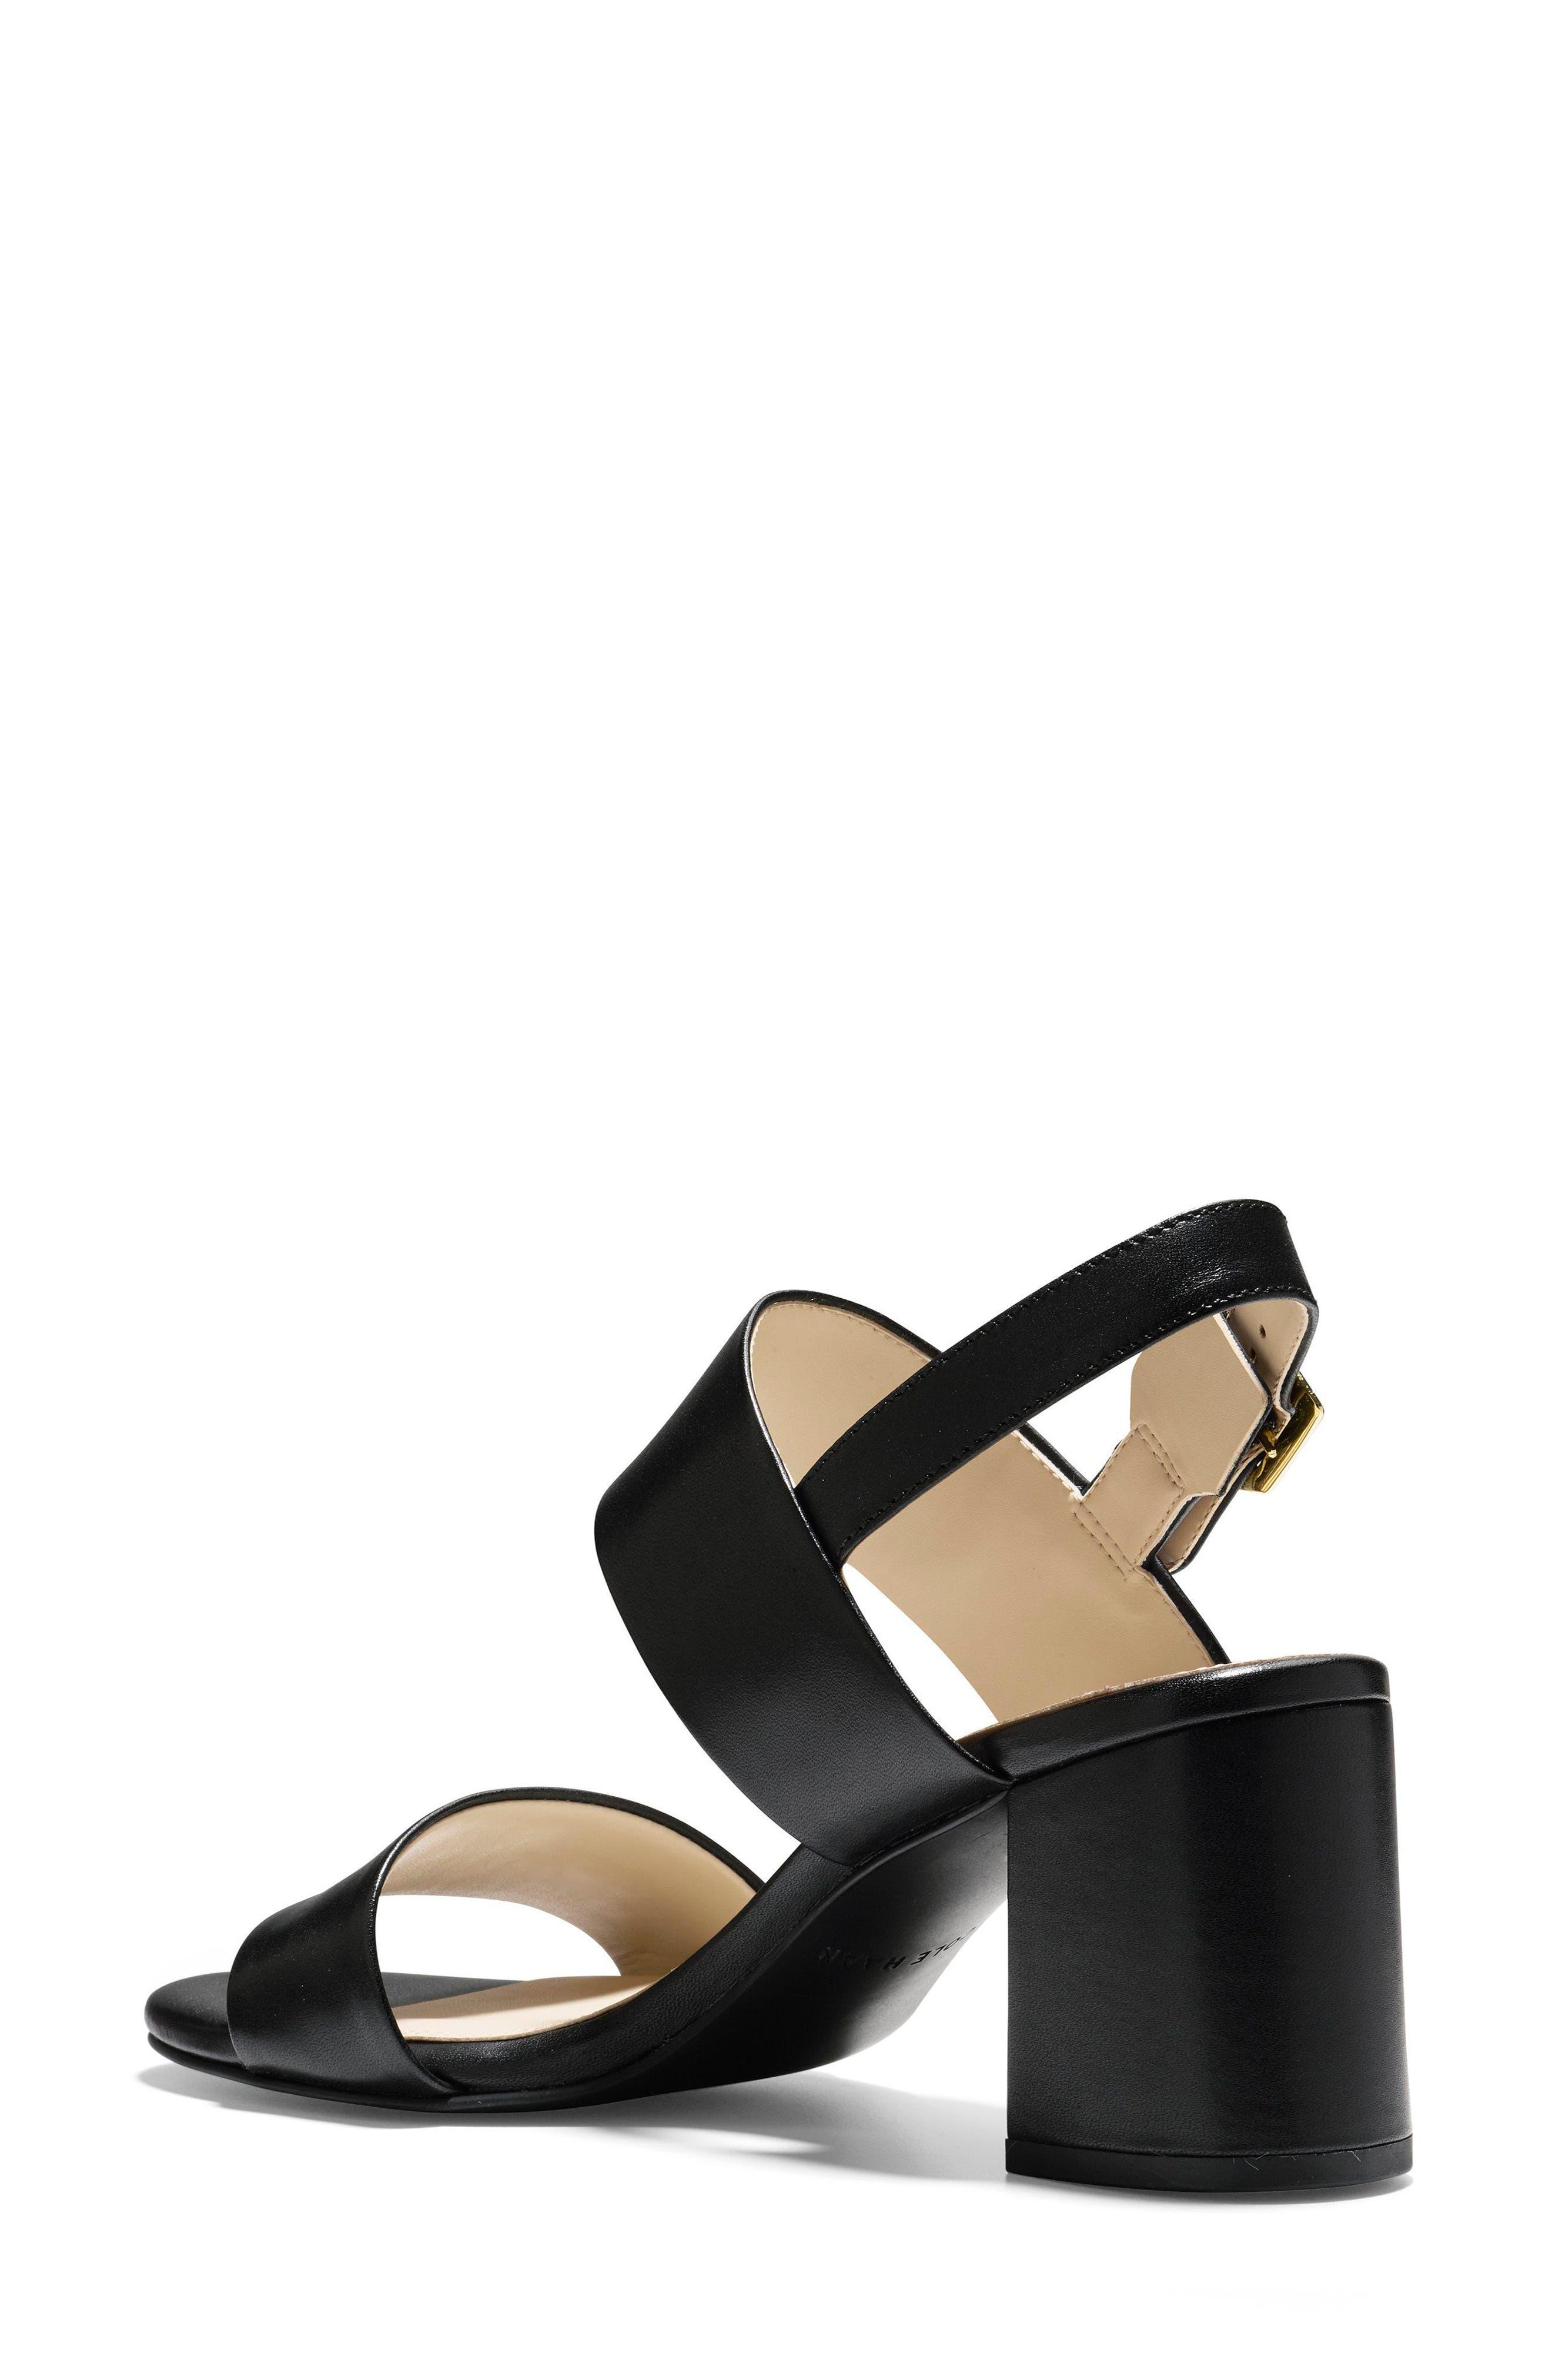 Avani Block Heel Sandal,                             Alternate thumbnail 2, color,                             Black Leather